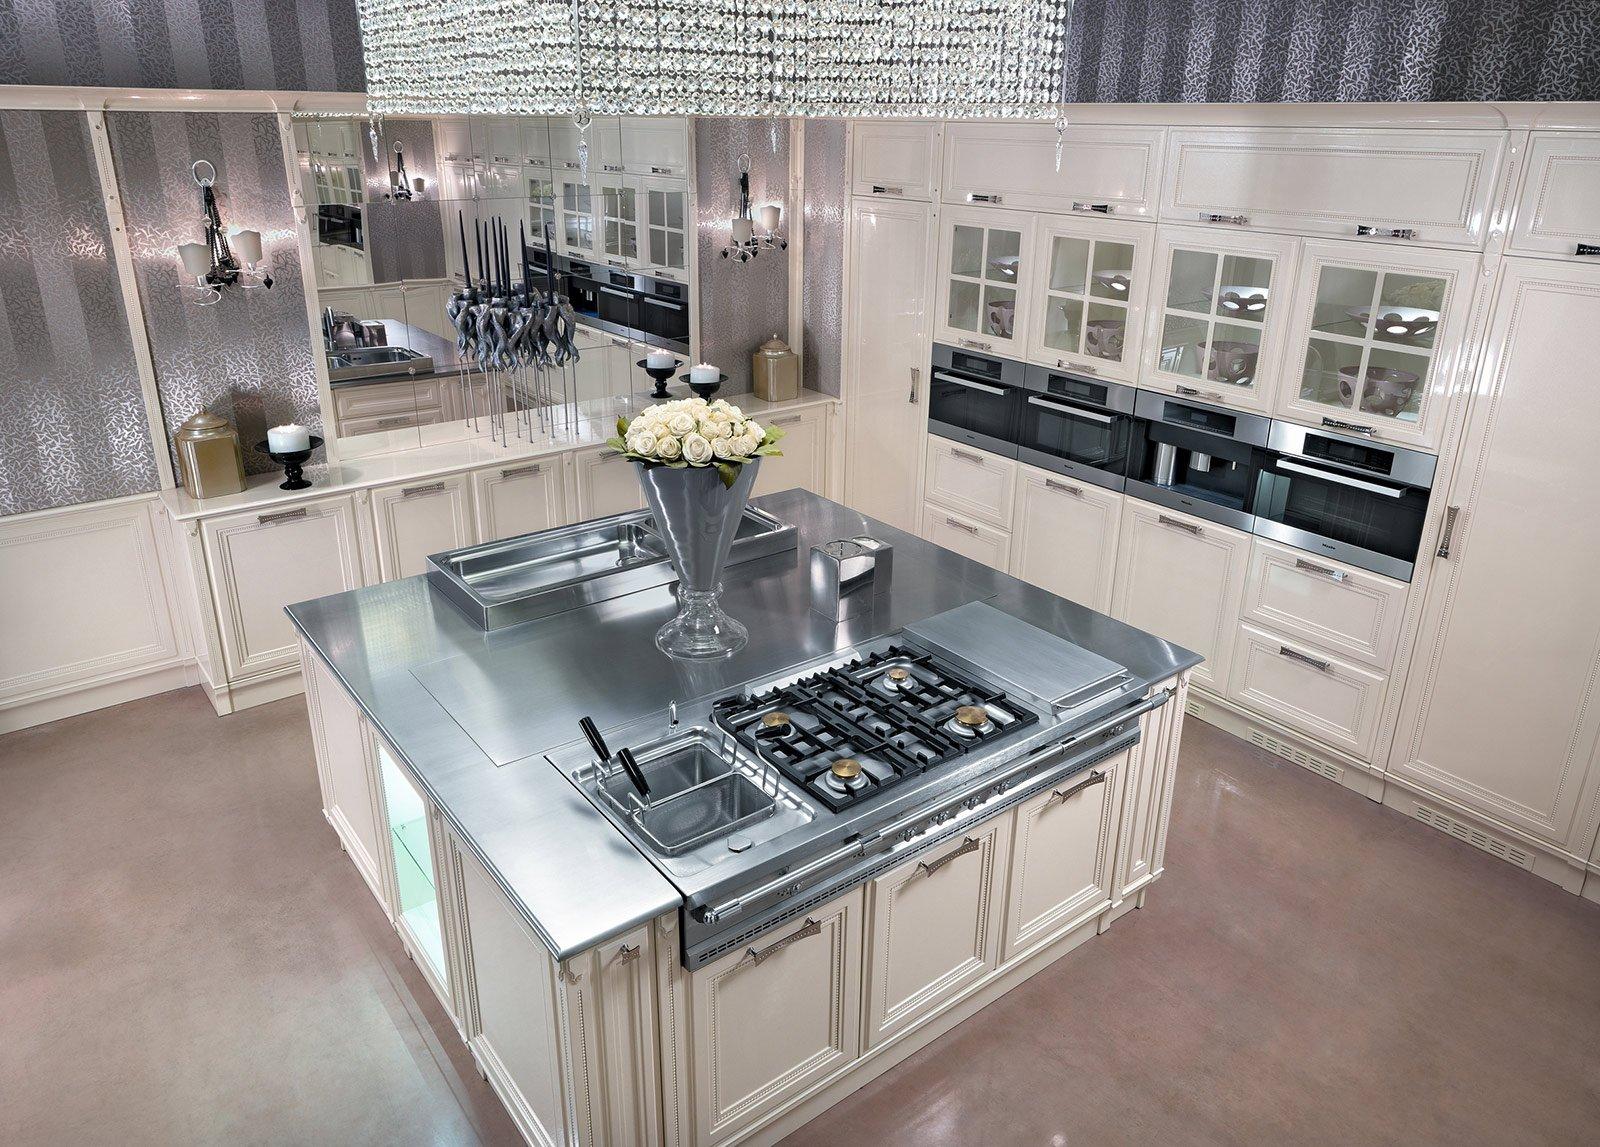 Cucine in stile cose di casa for Piani di casa aperti con grandi cucine